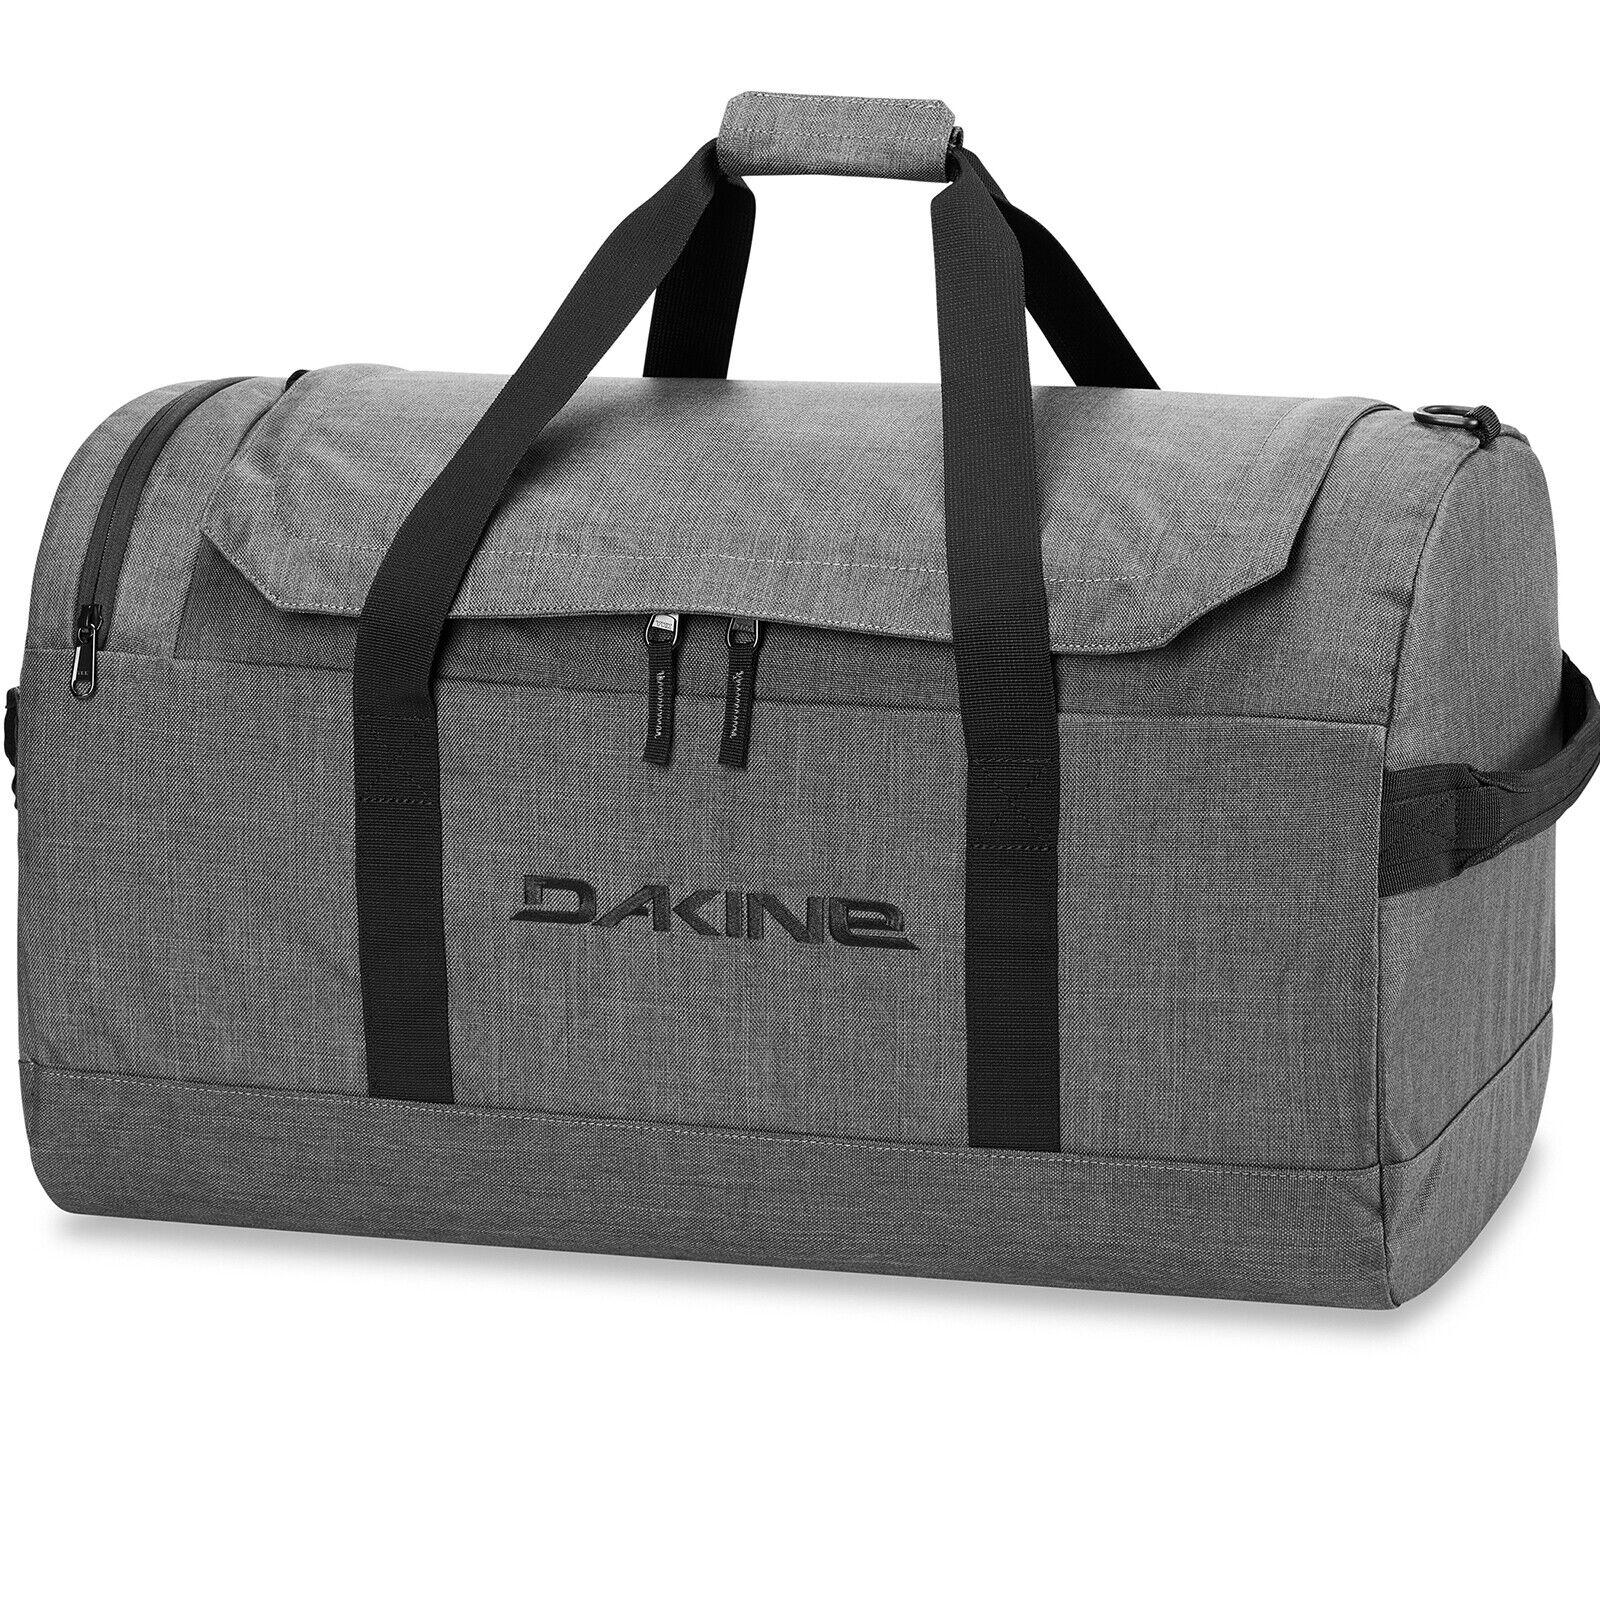 Dakine EQ 70L Duffle Bag, Carbon - $60.00